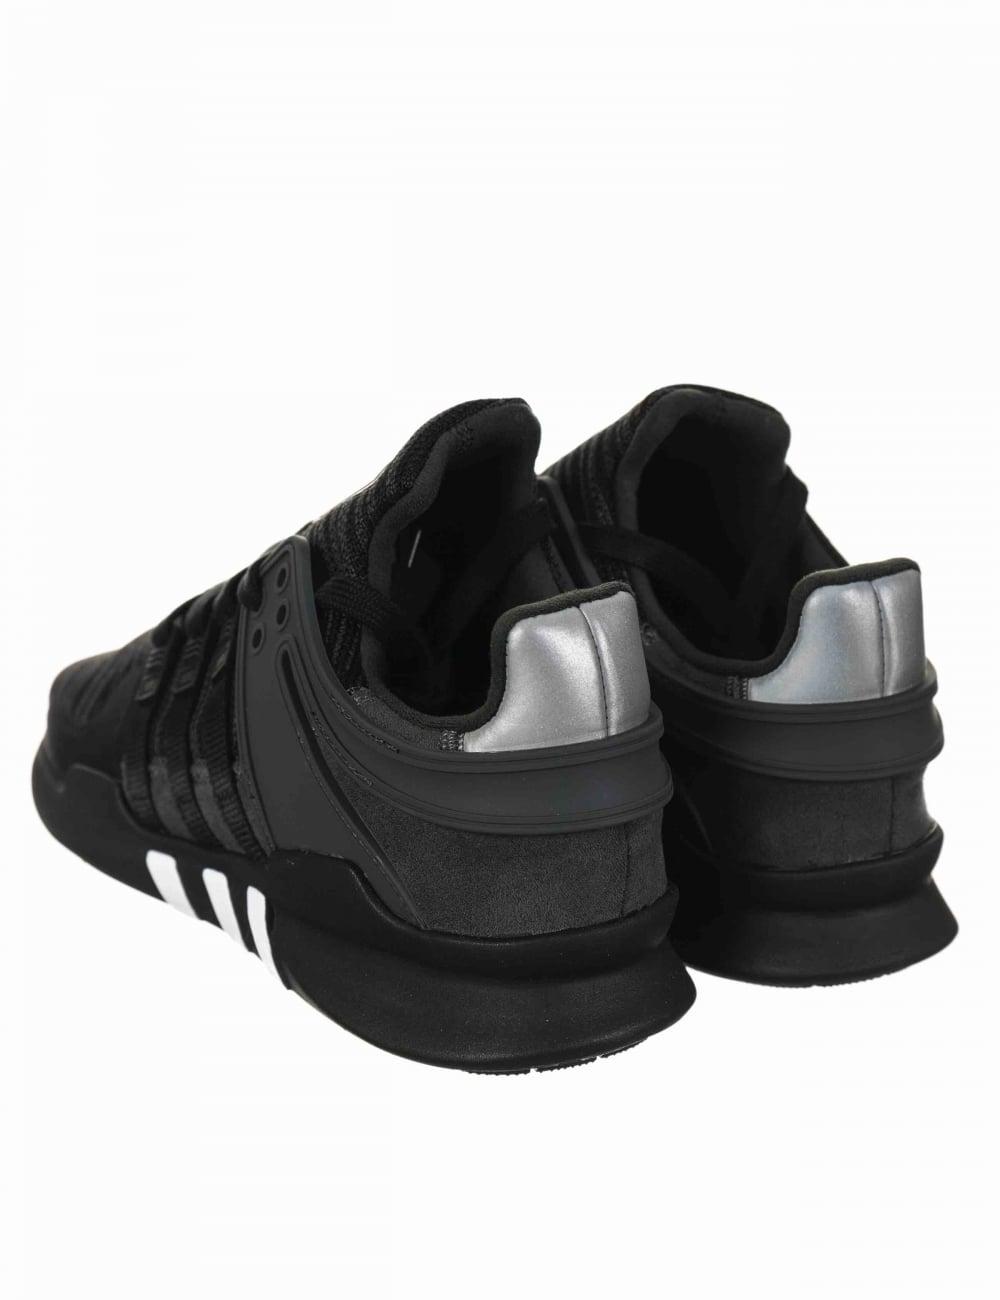 huge discount 93dba 18ea1 EQT Support Advance Shoes - Core Black/Utility Black (BB1297)